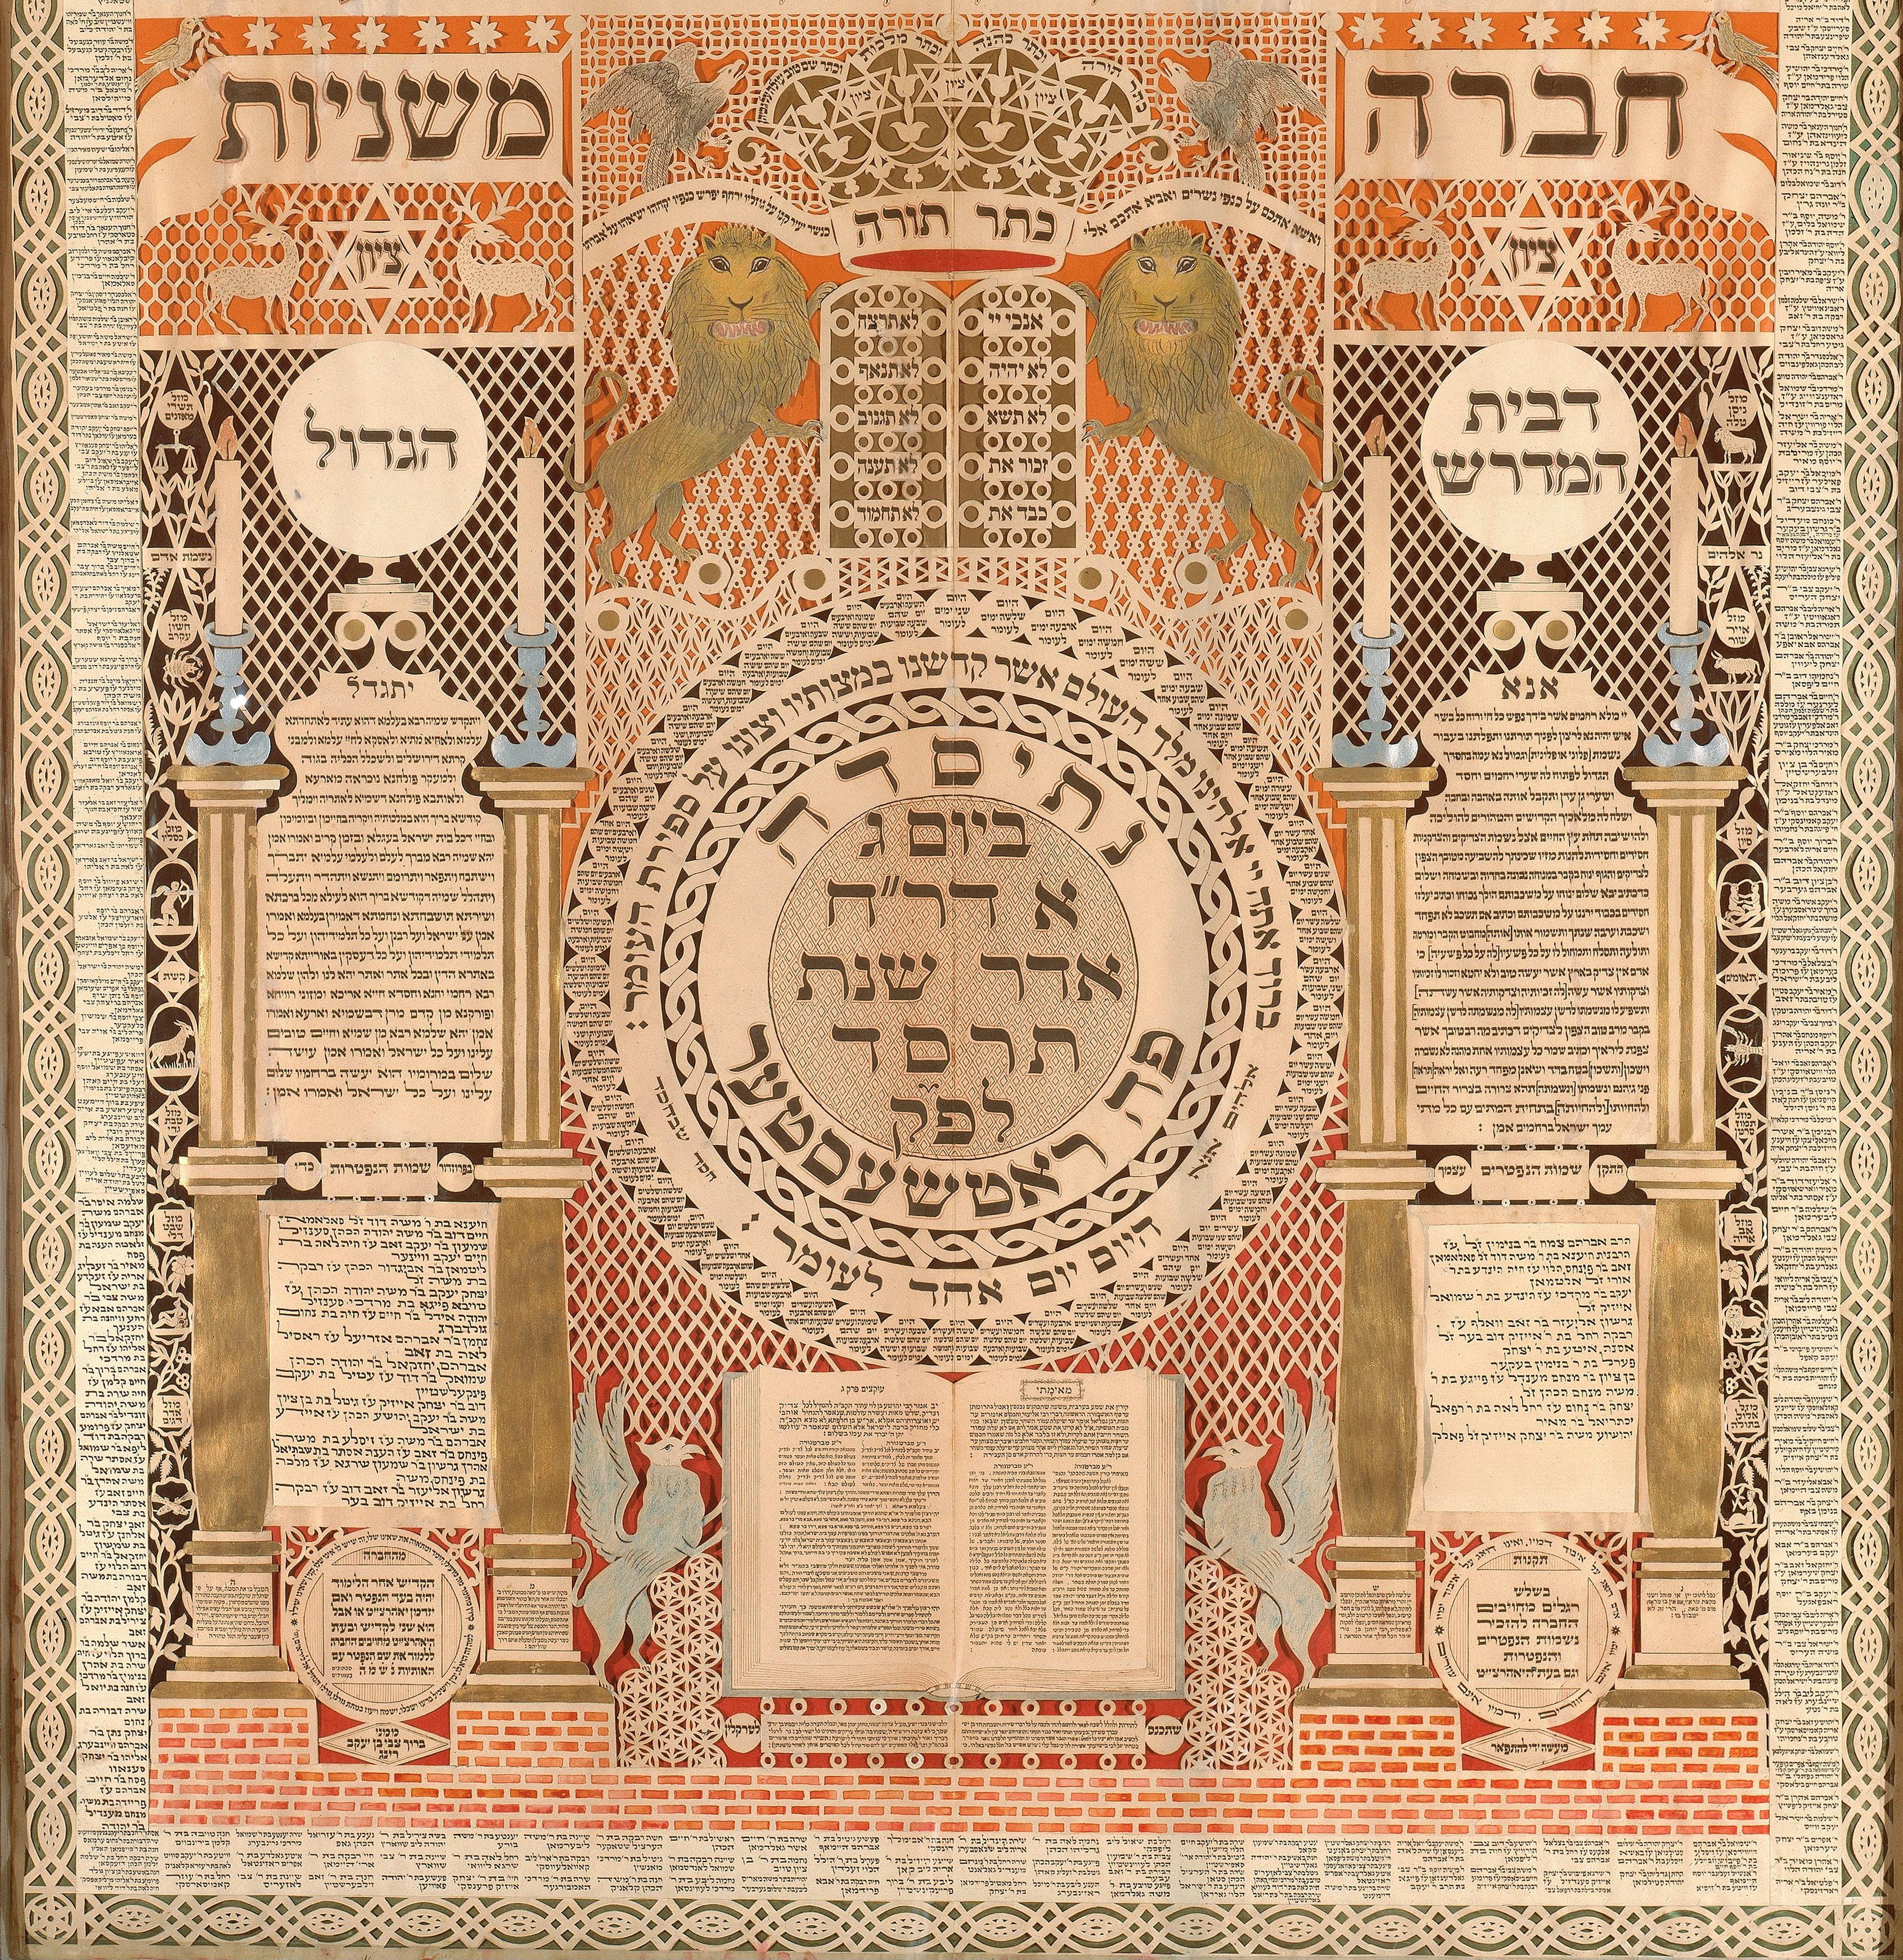 """Memorial Tablet and Omer Calendar"" by Baruch Zvi Ring, ca. 1900"